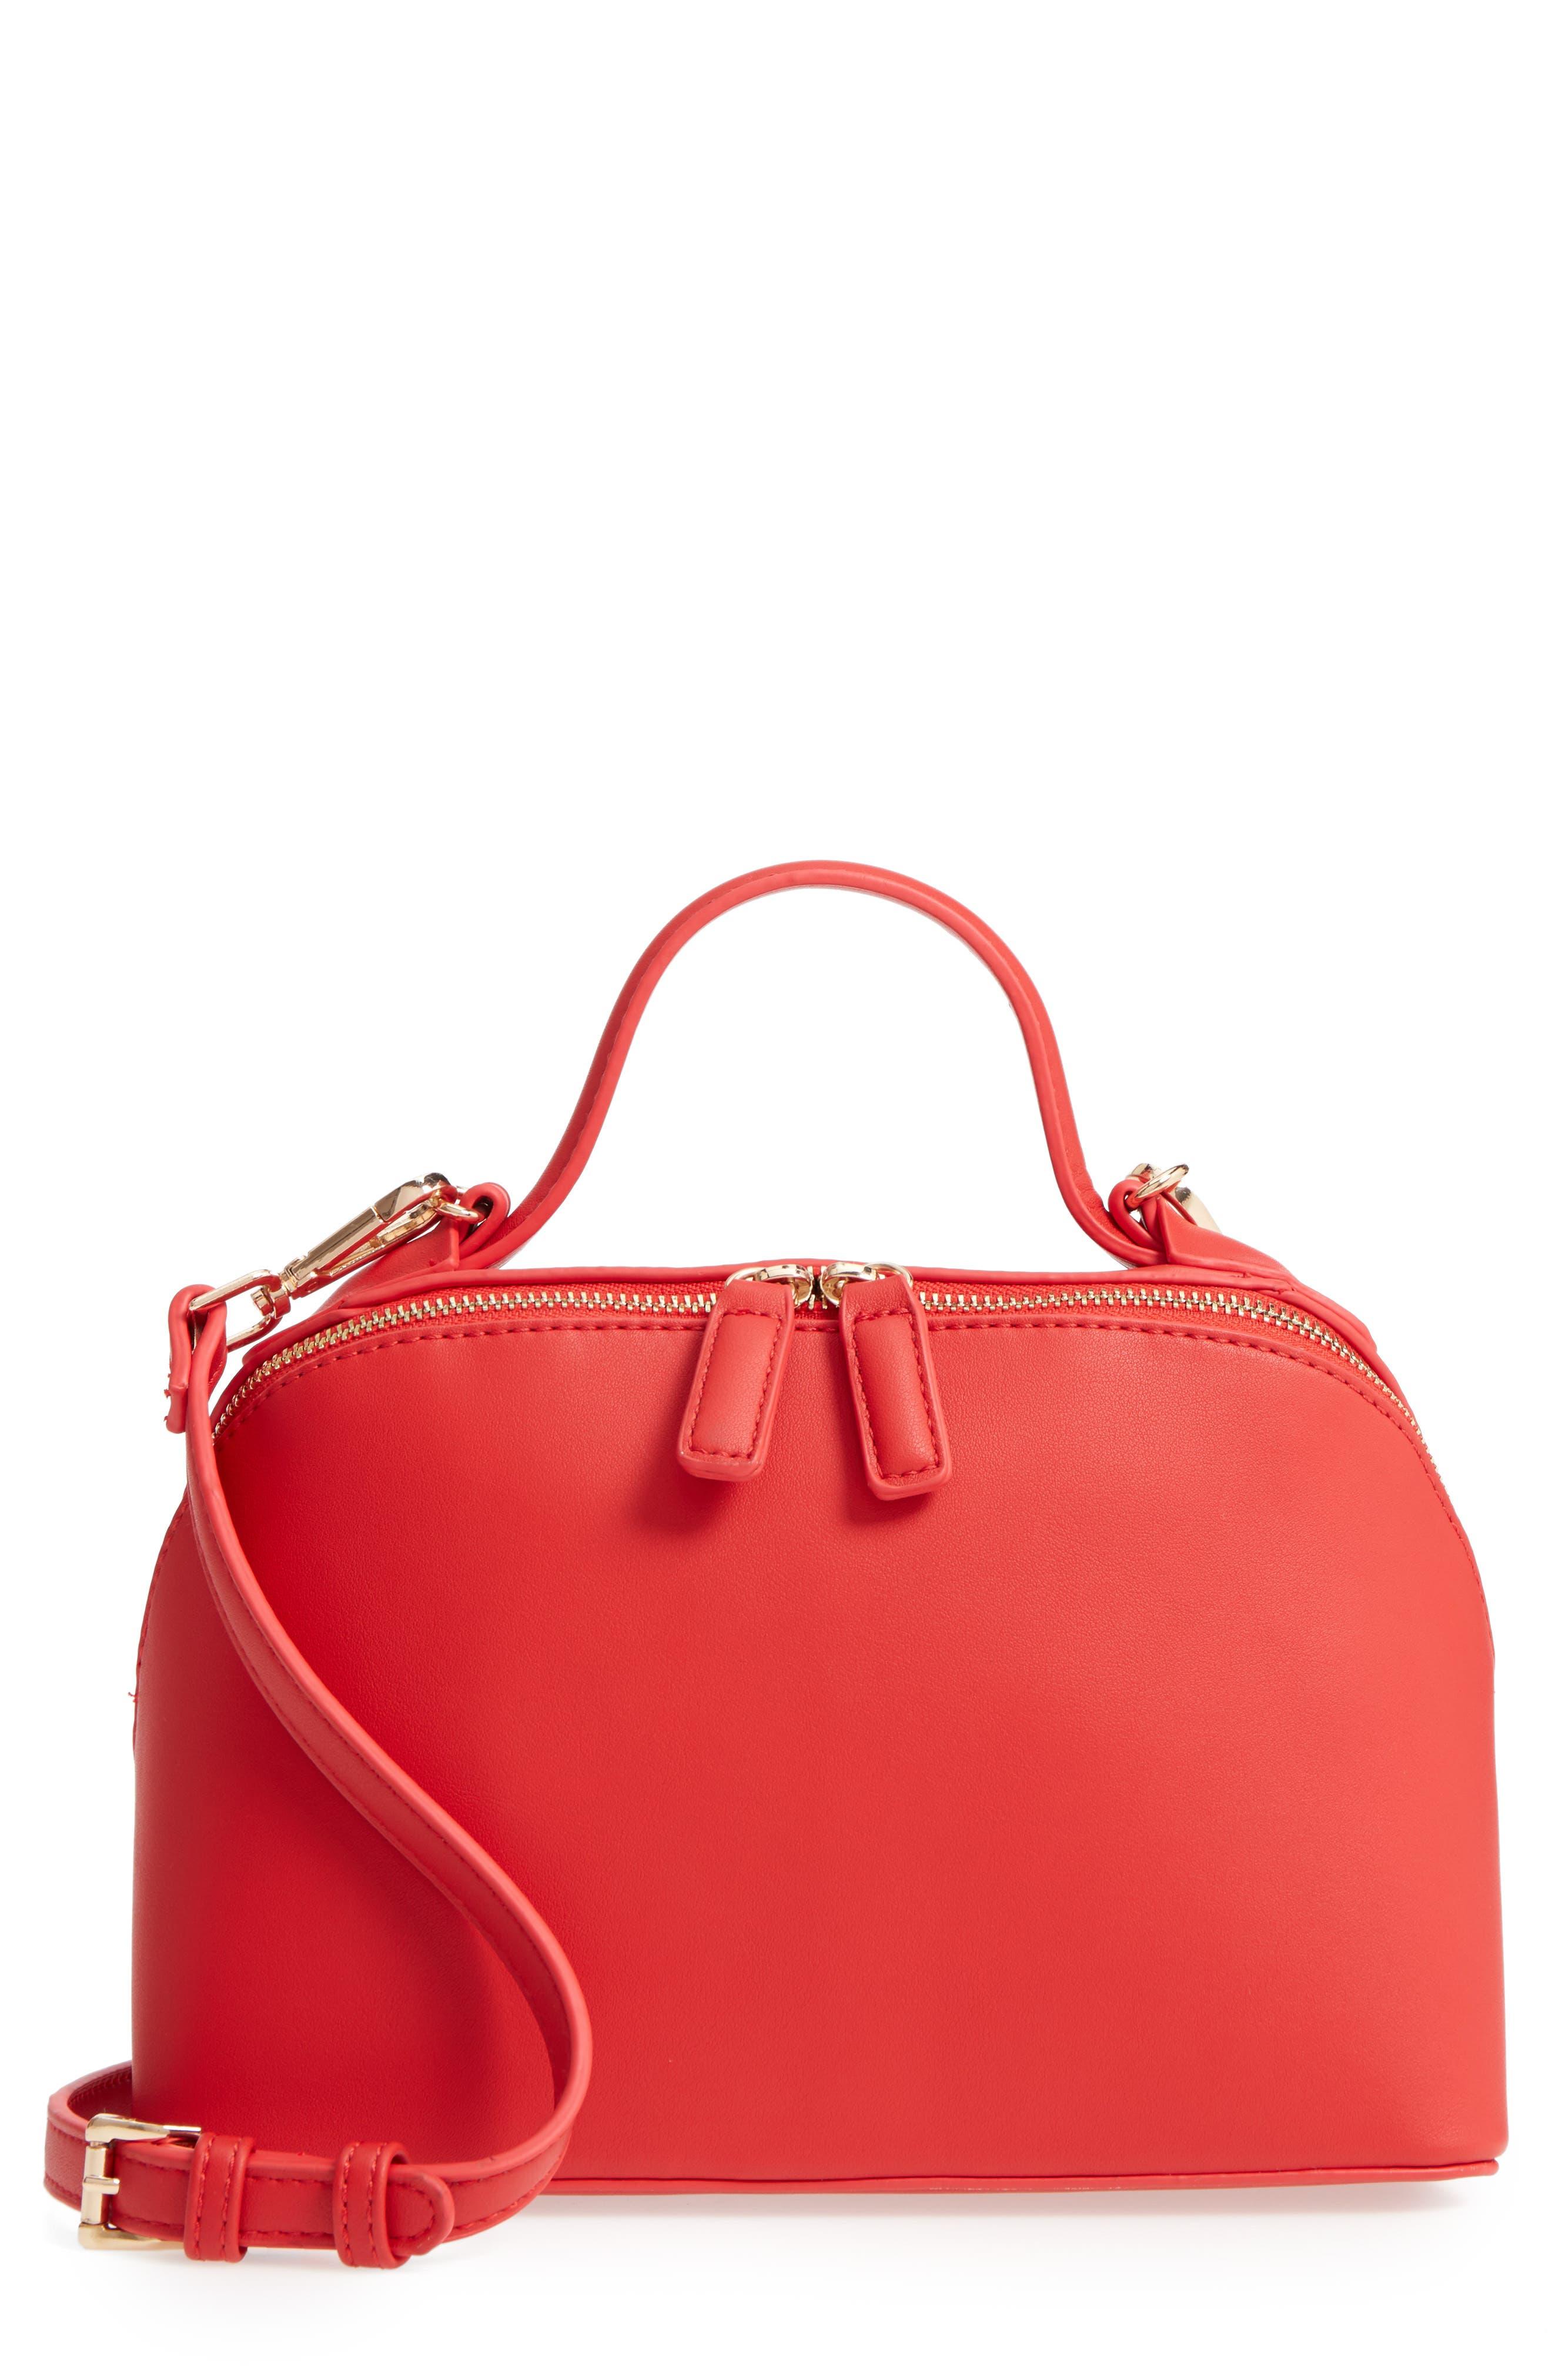 Top Handle Crossbody Bag,                             Main thumbnail 1, color,                             600